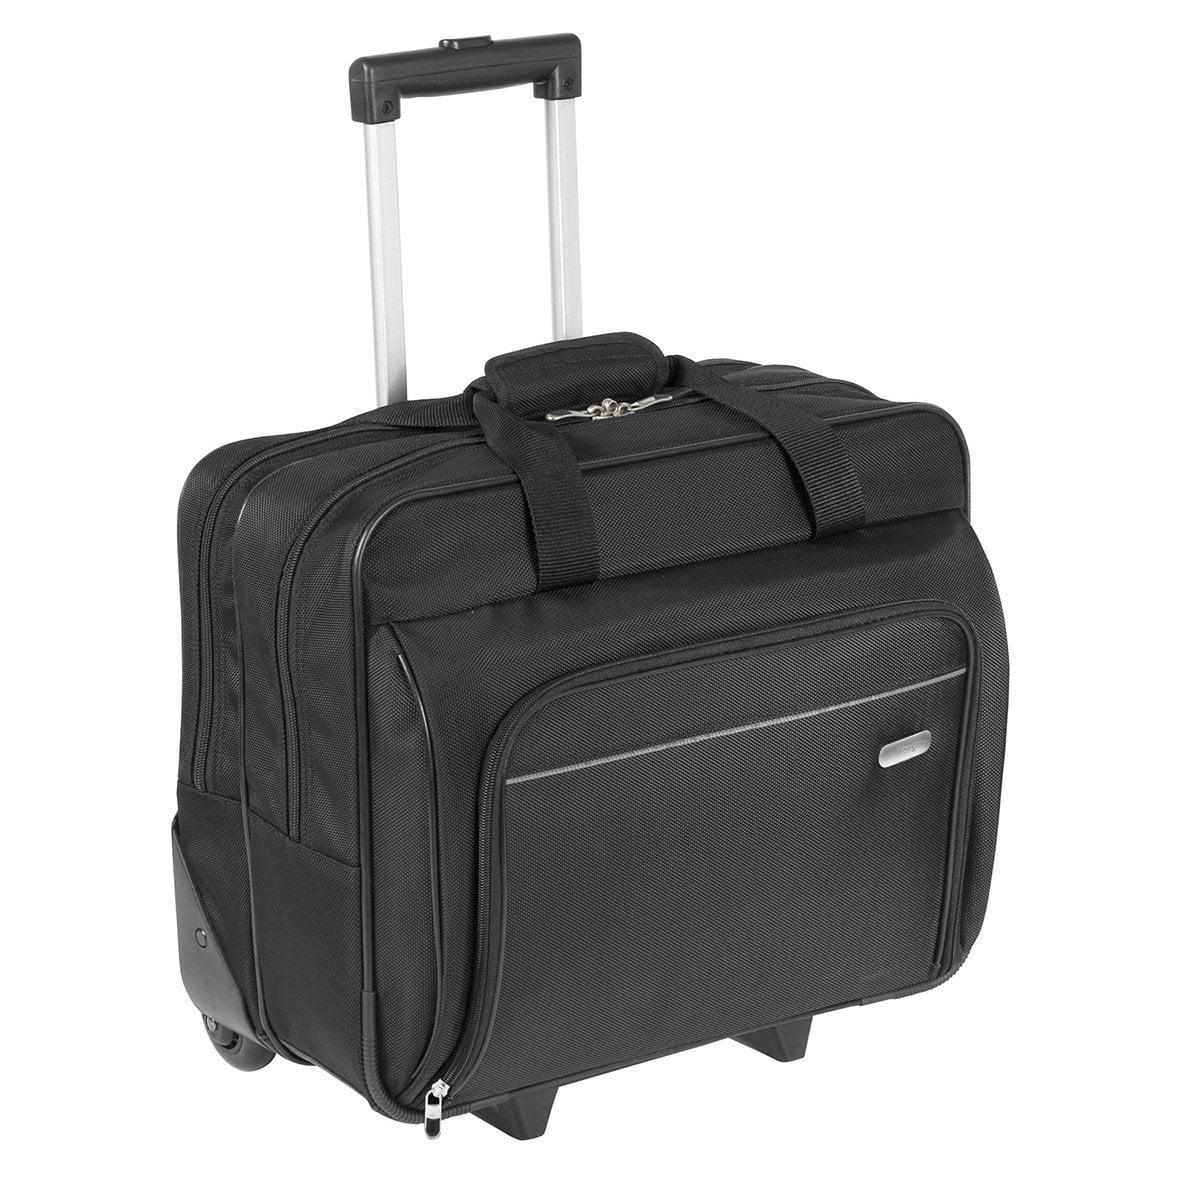 Targus TBR003EU 16' Rolling Laptop Case Bag by Targus